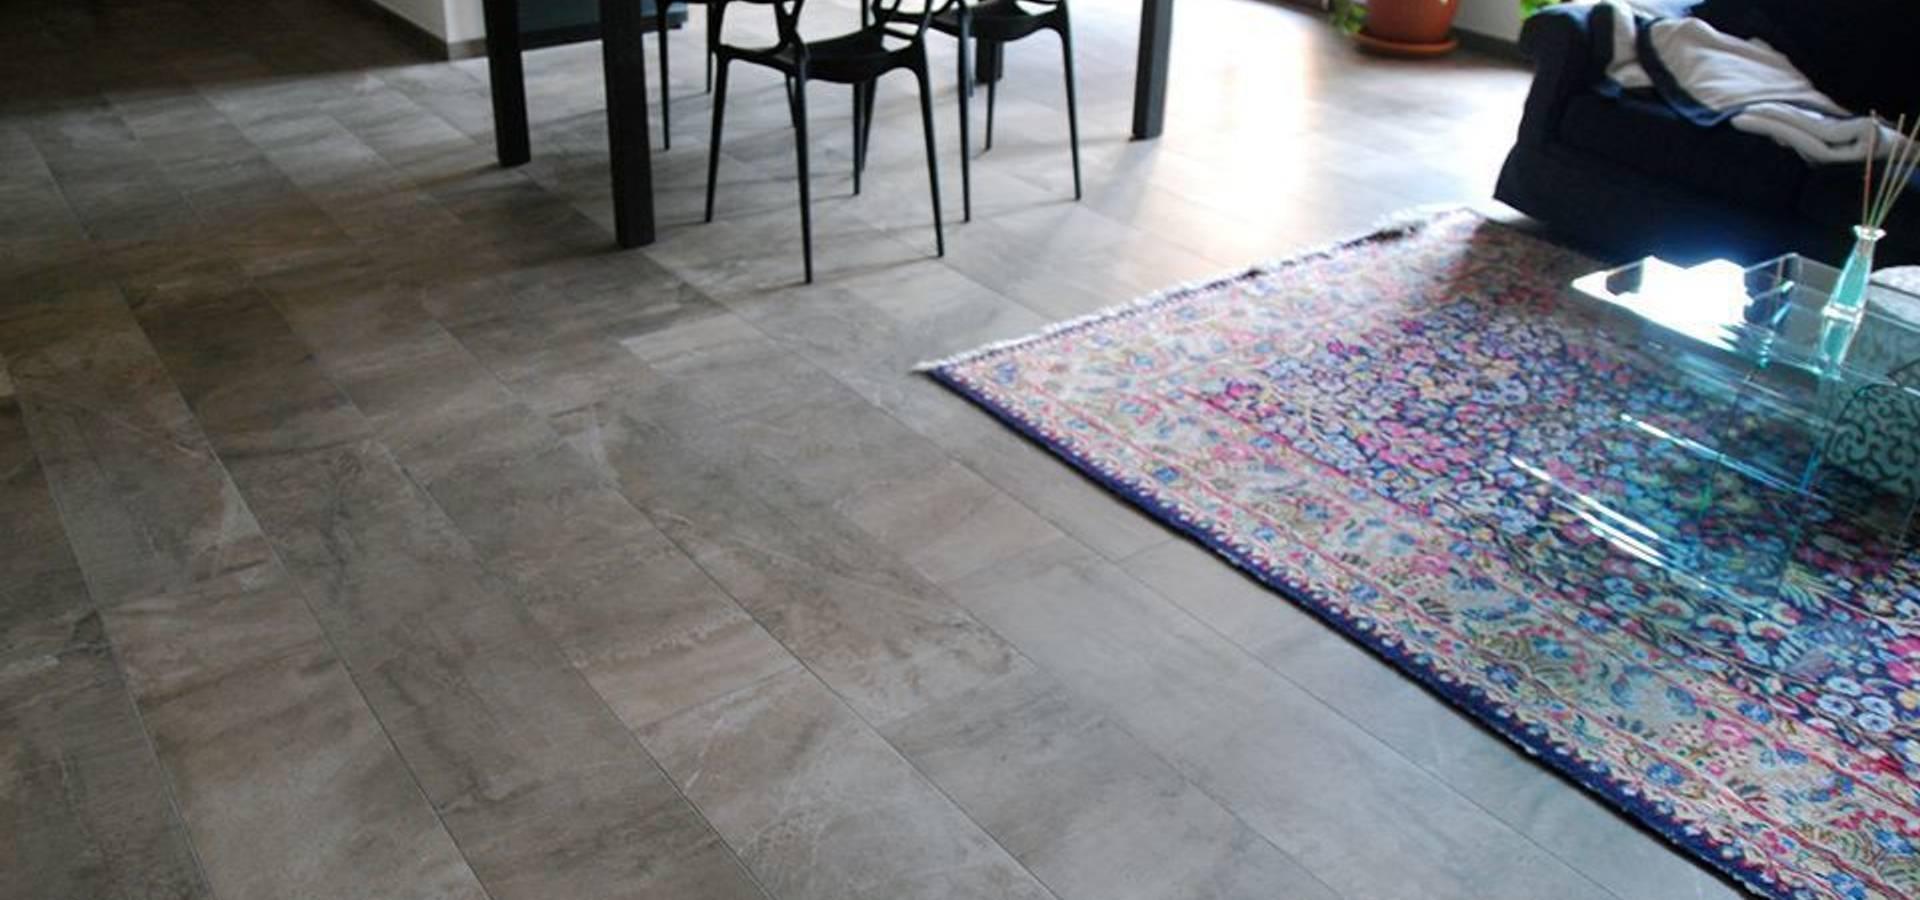 Fersini marco pavimenti e rivestimenti interni ed - Foto pavimenti ...